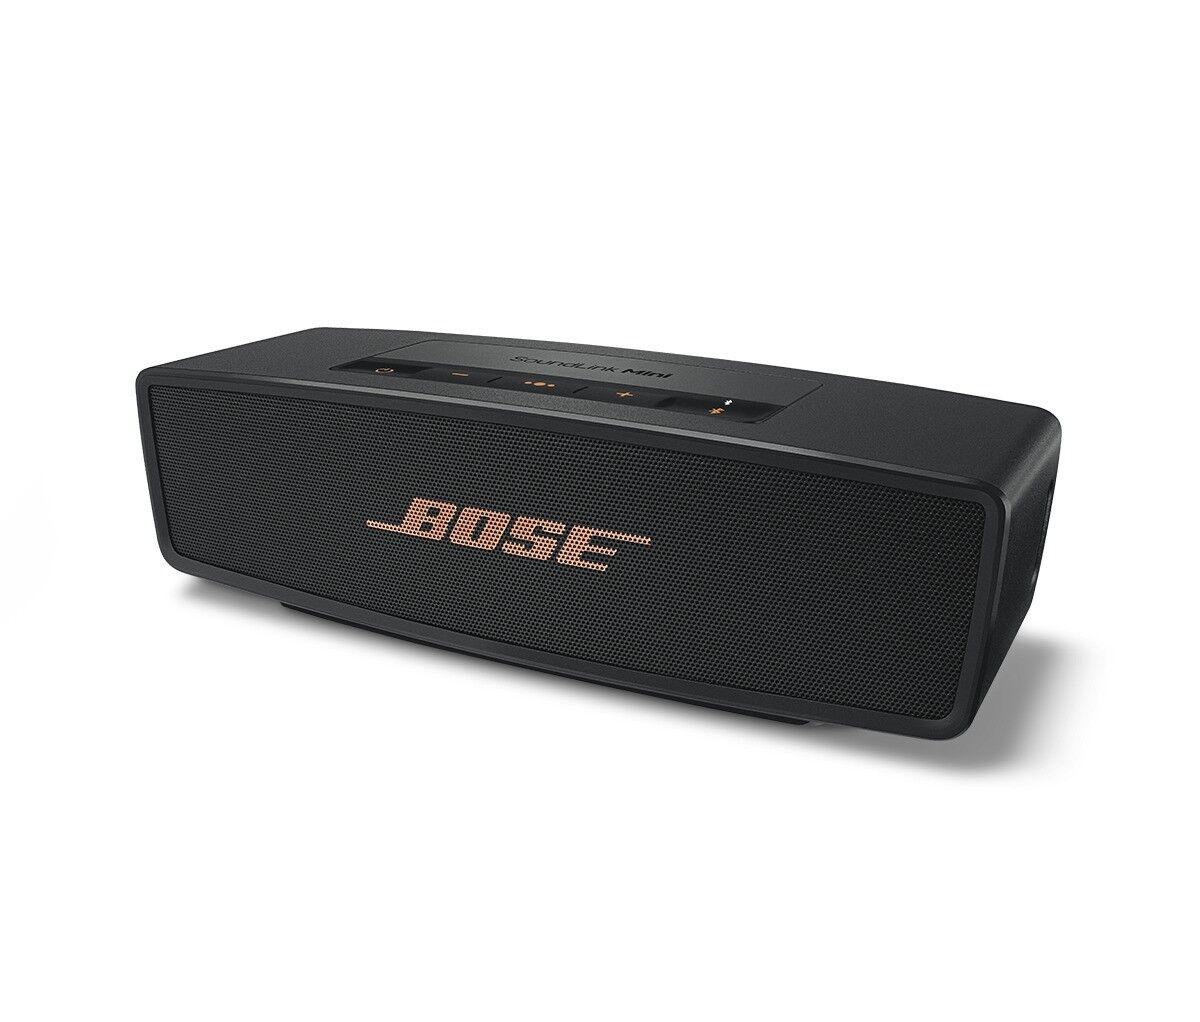 Bose SoundLink Mini II Bluetooth Speaker, Factory-Renewed